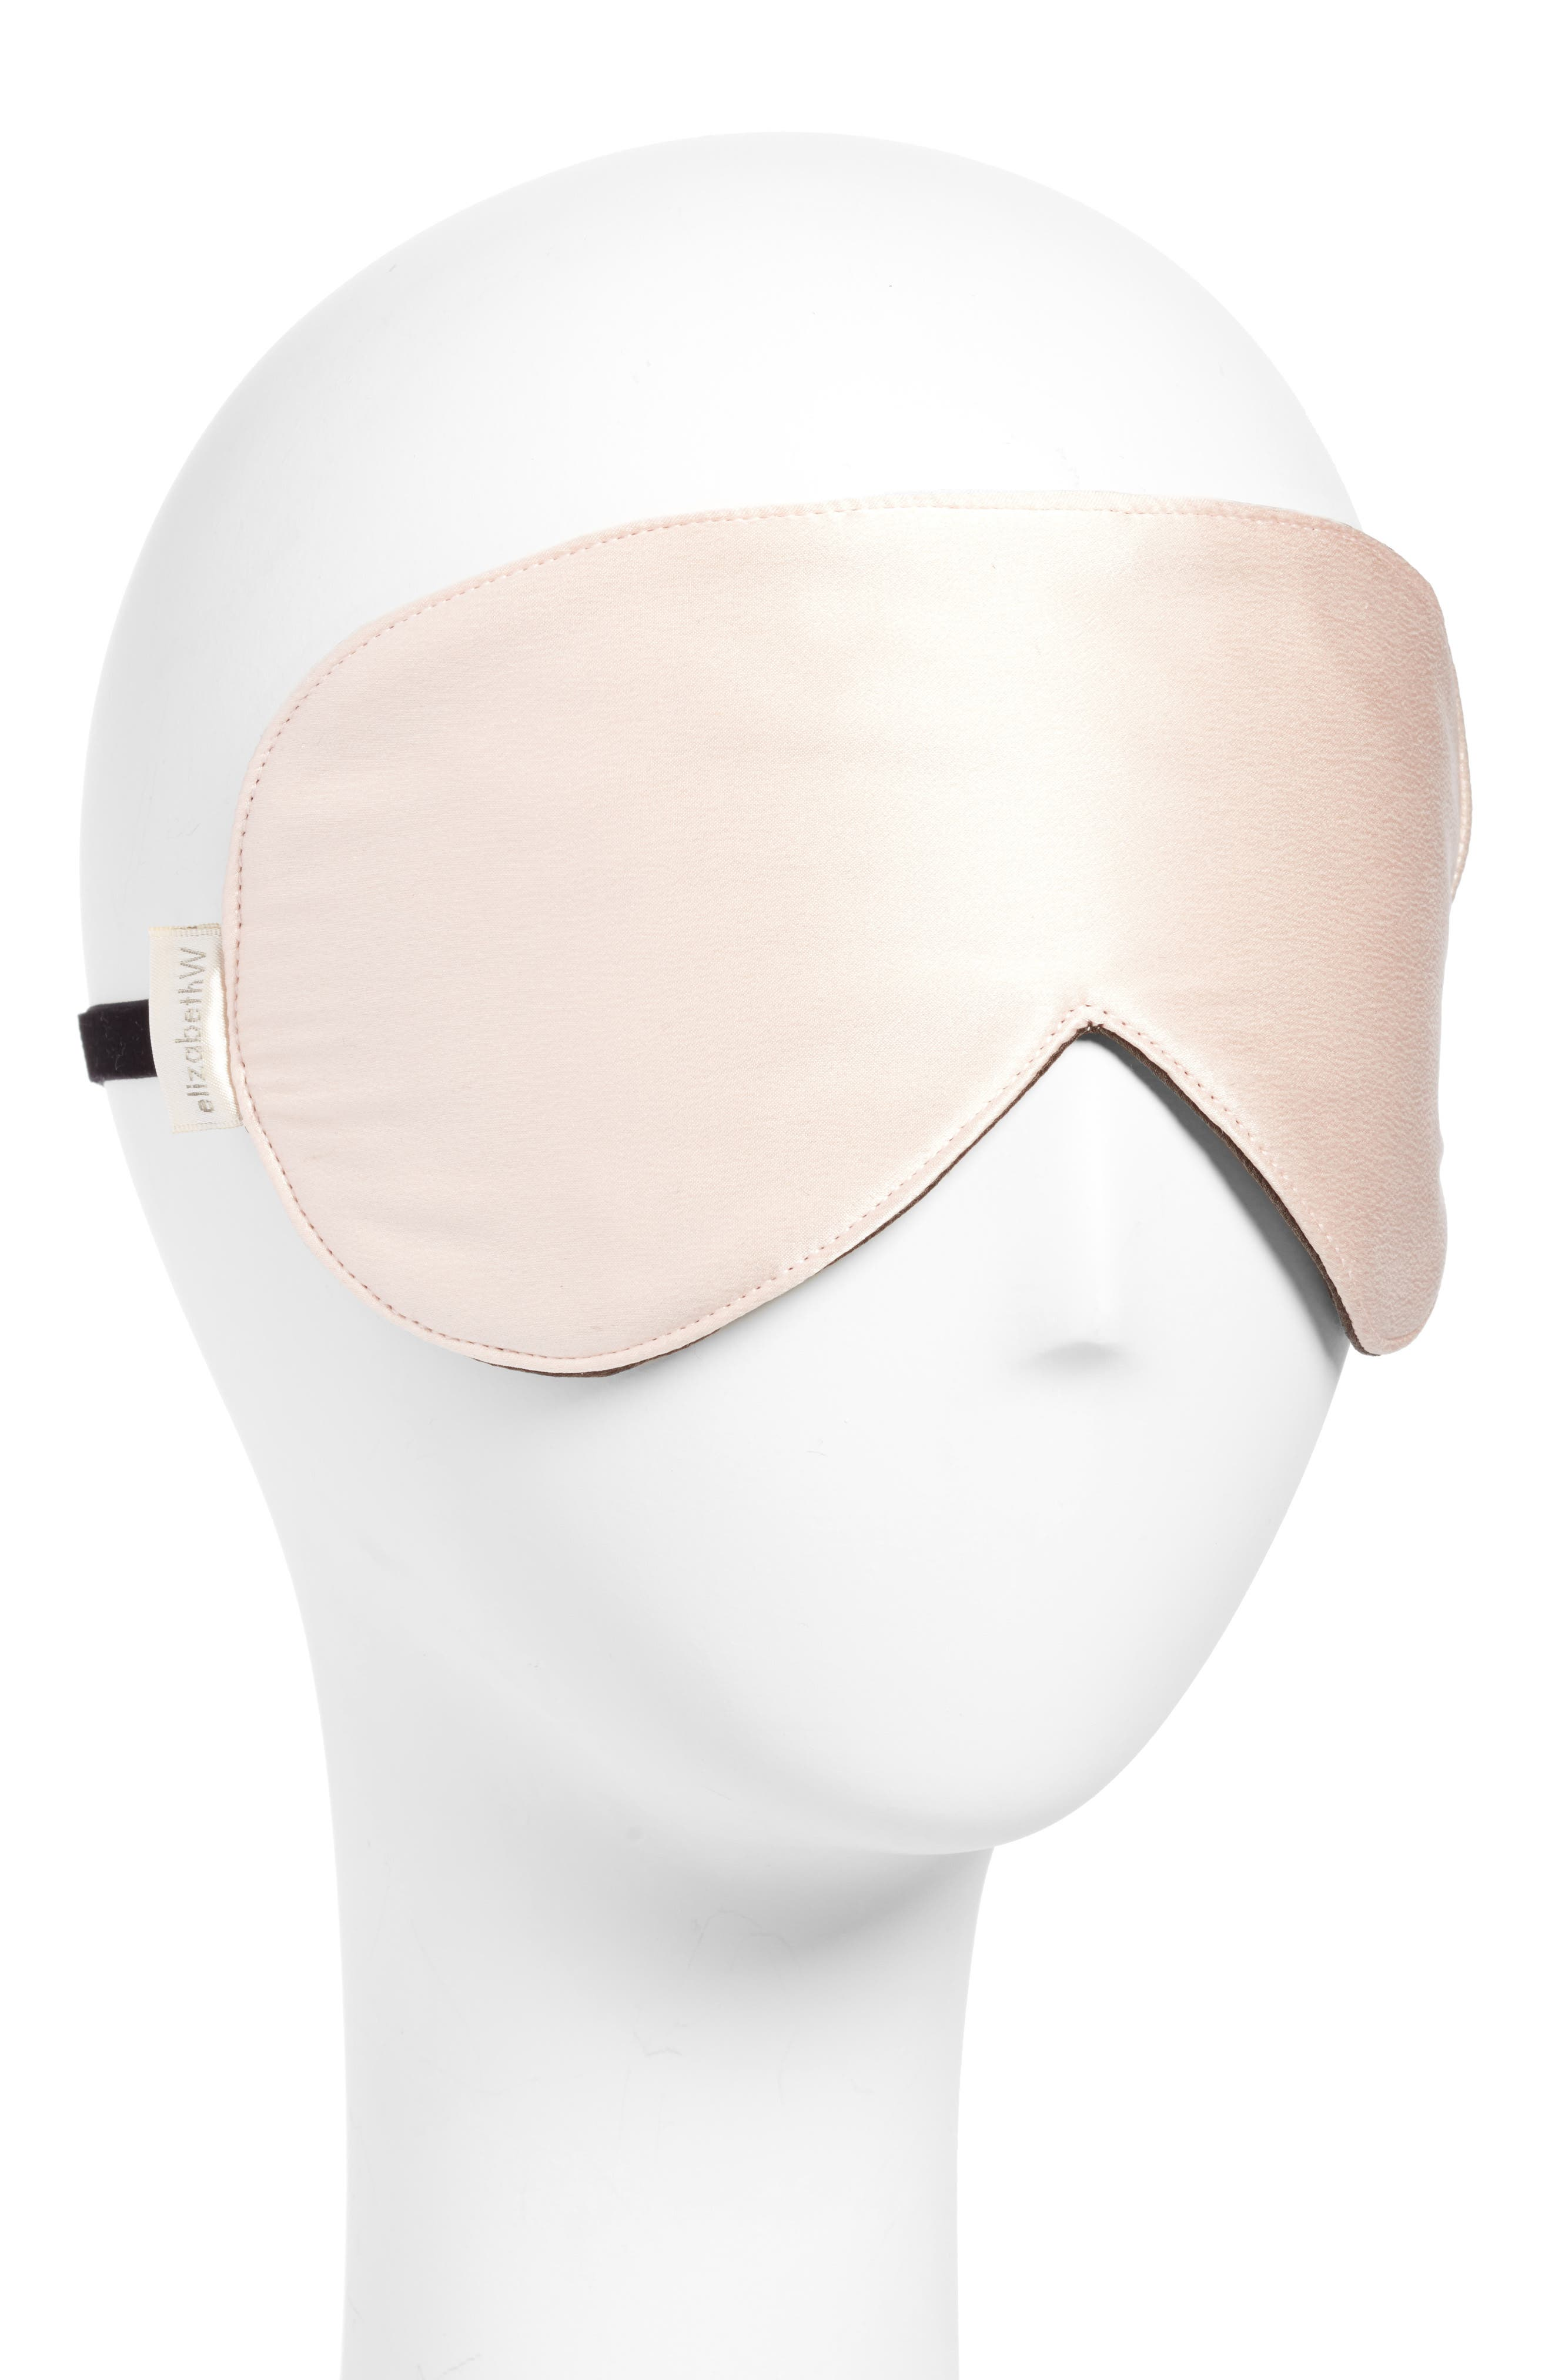 ELIZABETHW Silk Sleep Mask, Main, color, 650